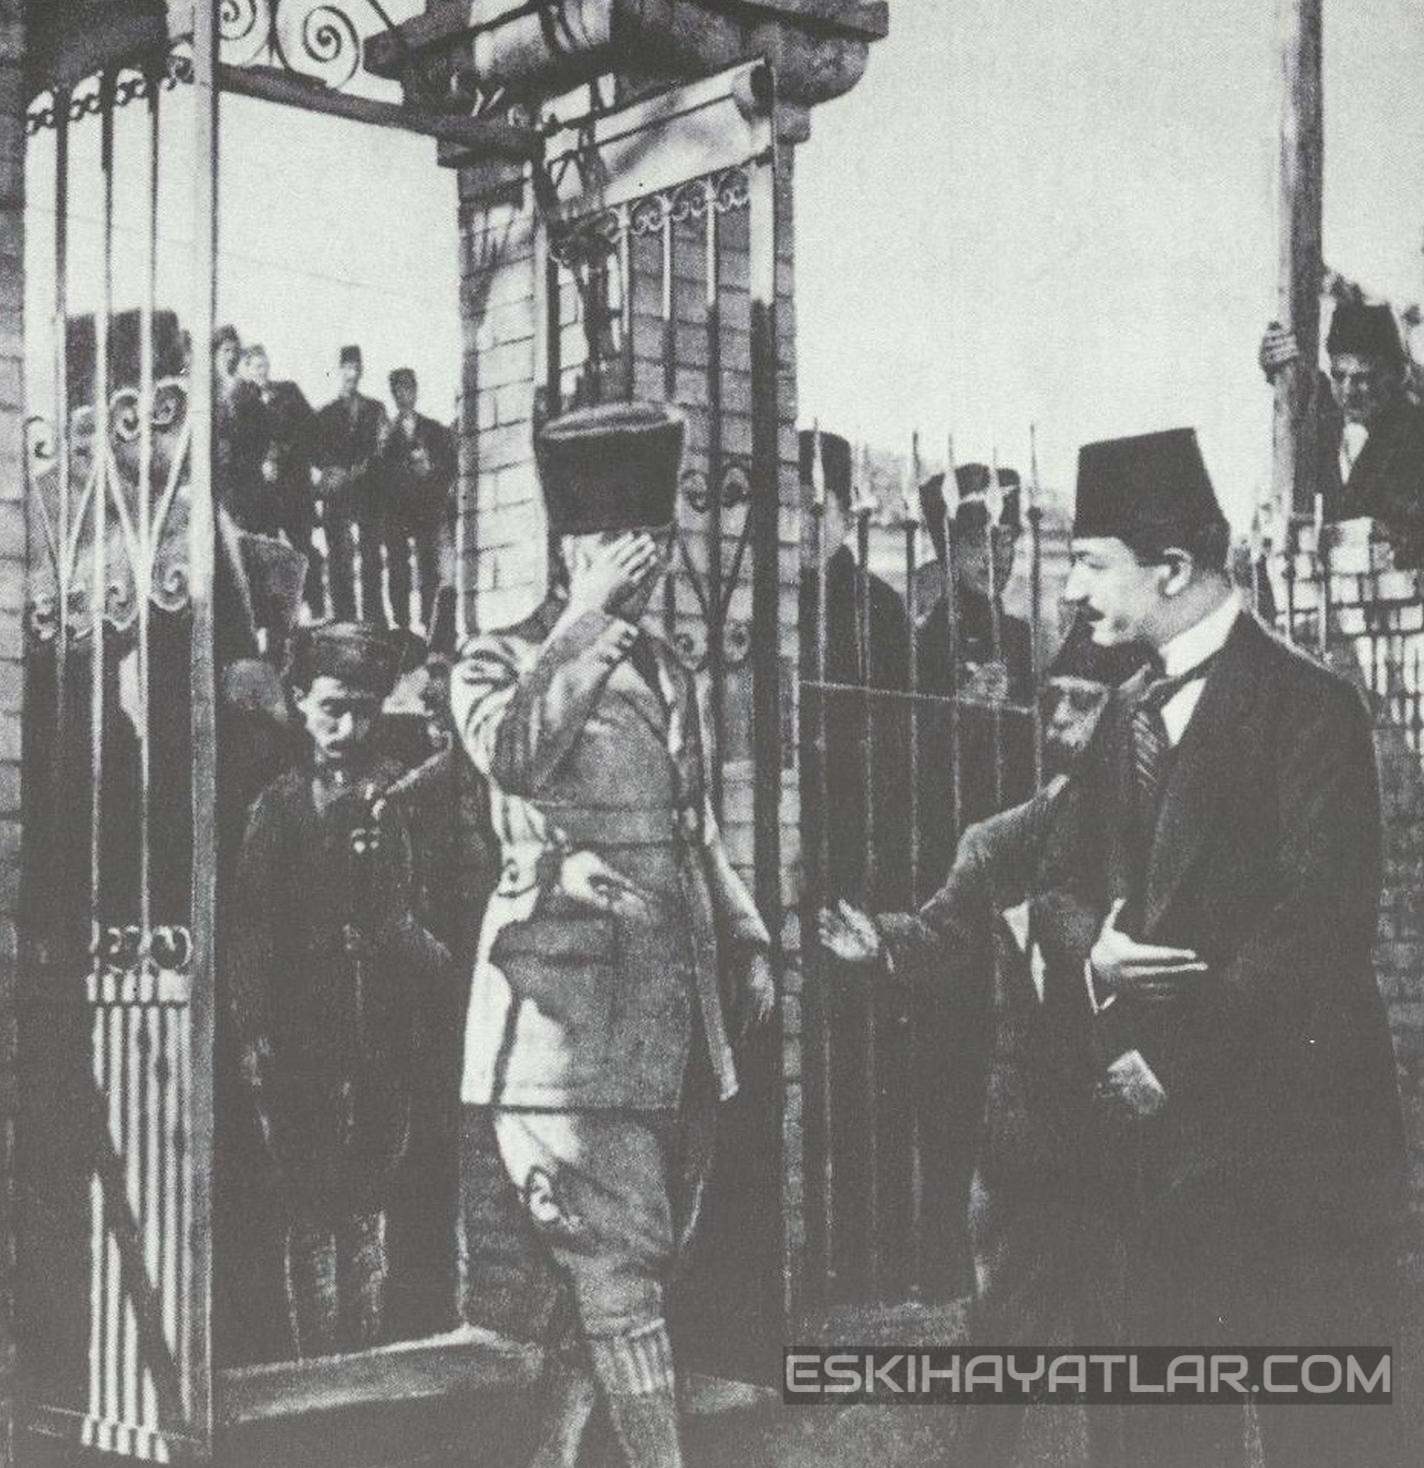 ataturk-izmir-gunleri-mustafa-kemal-pasa-1922-izmir-fotograflari (11)